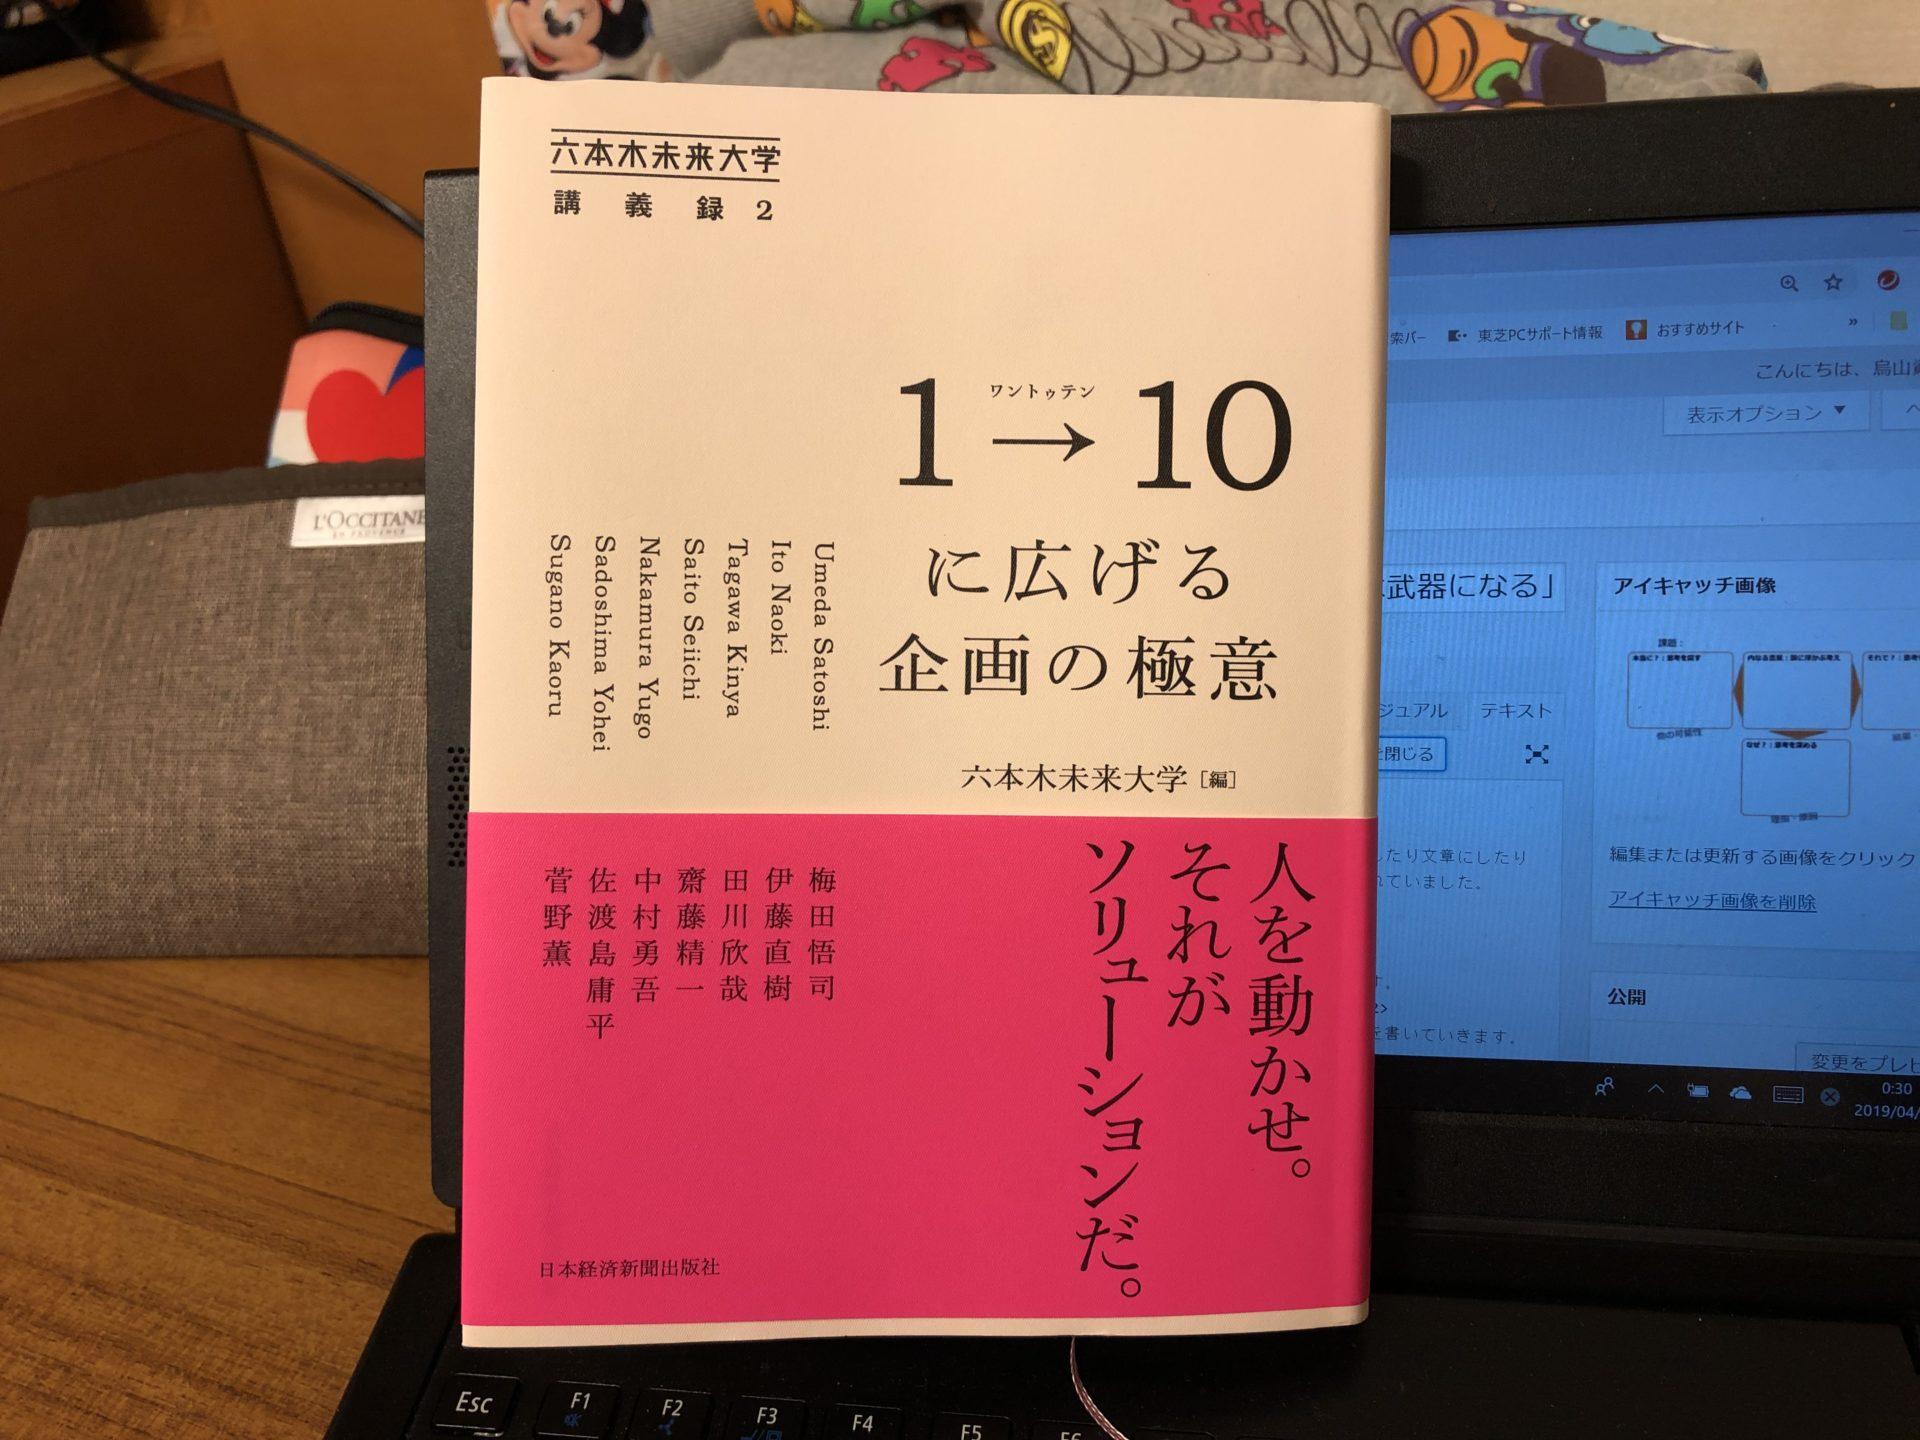 『1→10に広げる企画の極意』(六本木未来大学編日本経済新聞出版社